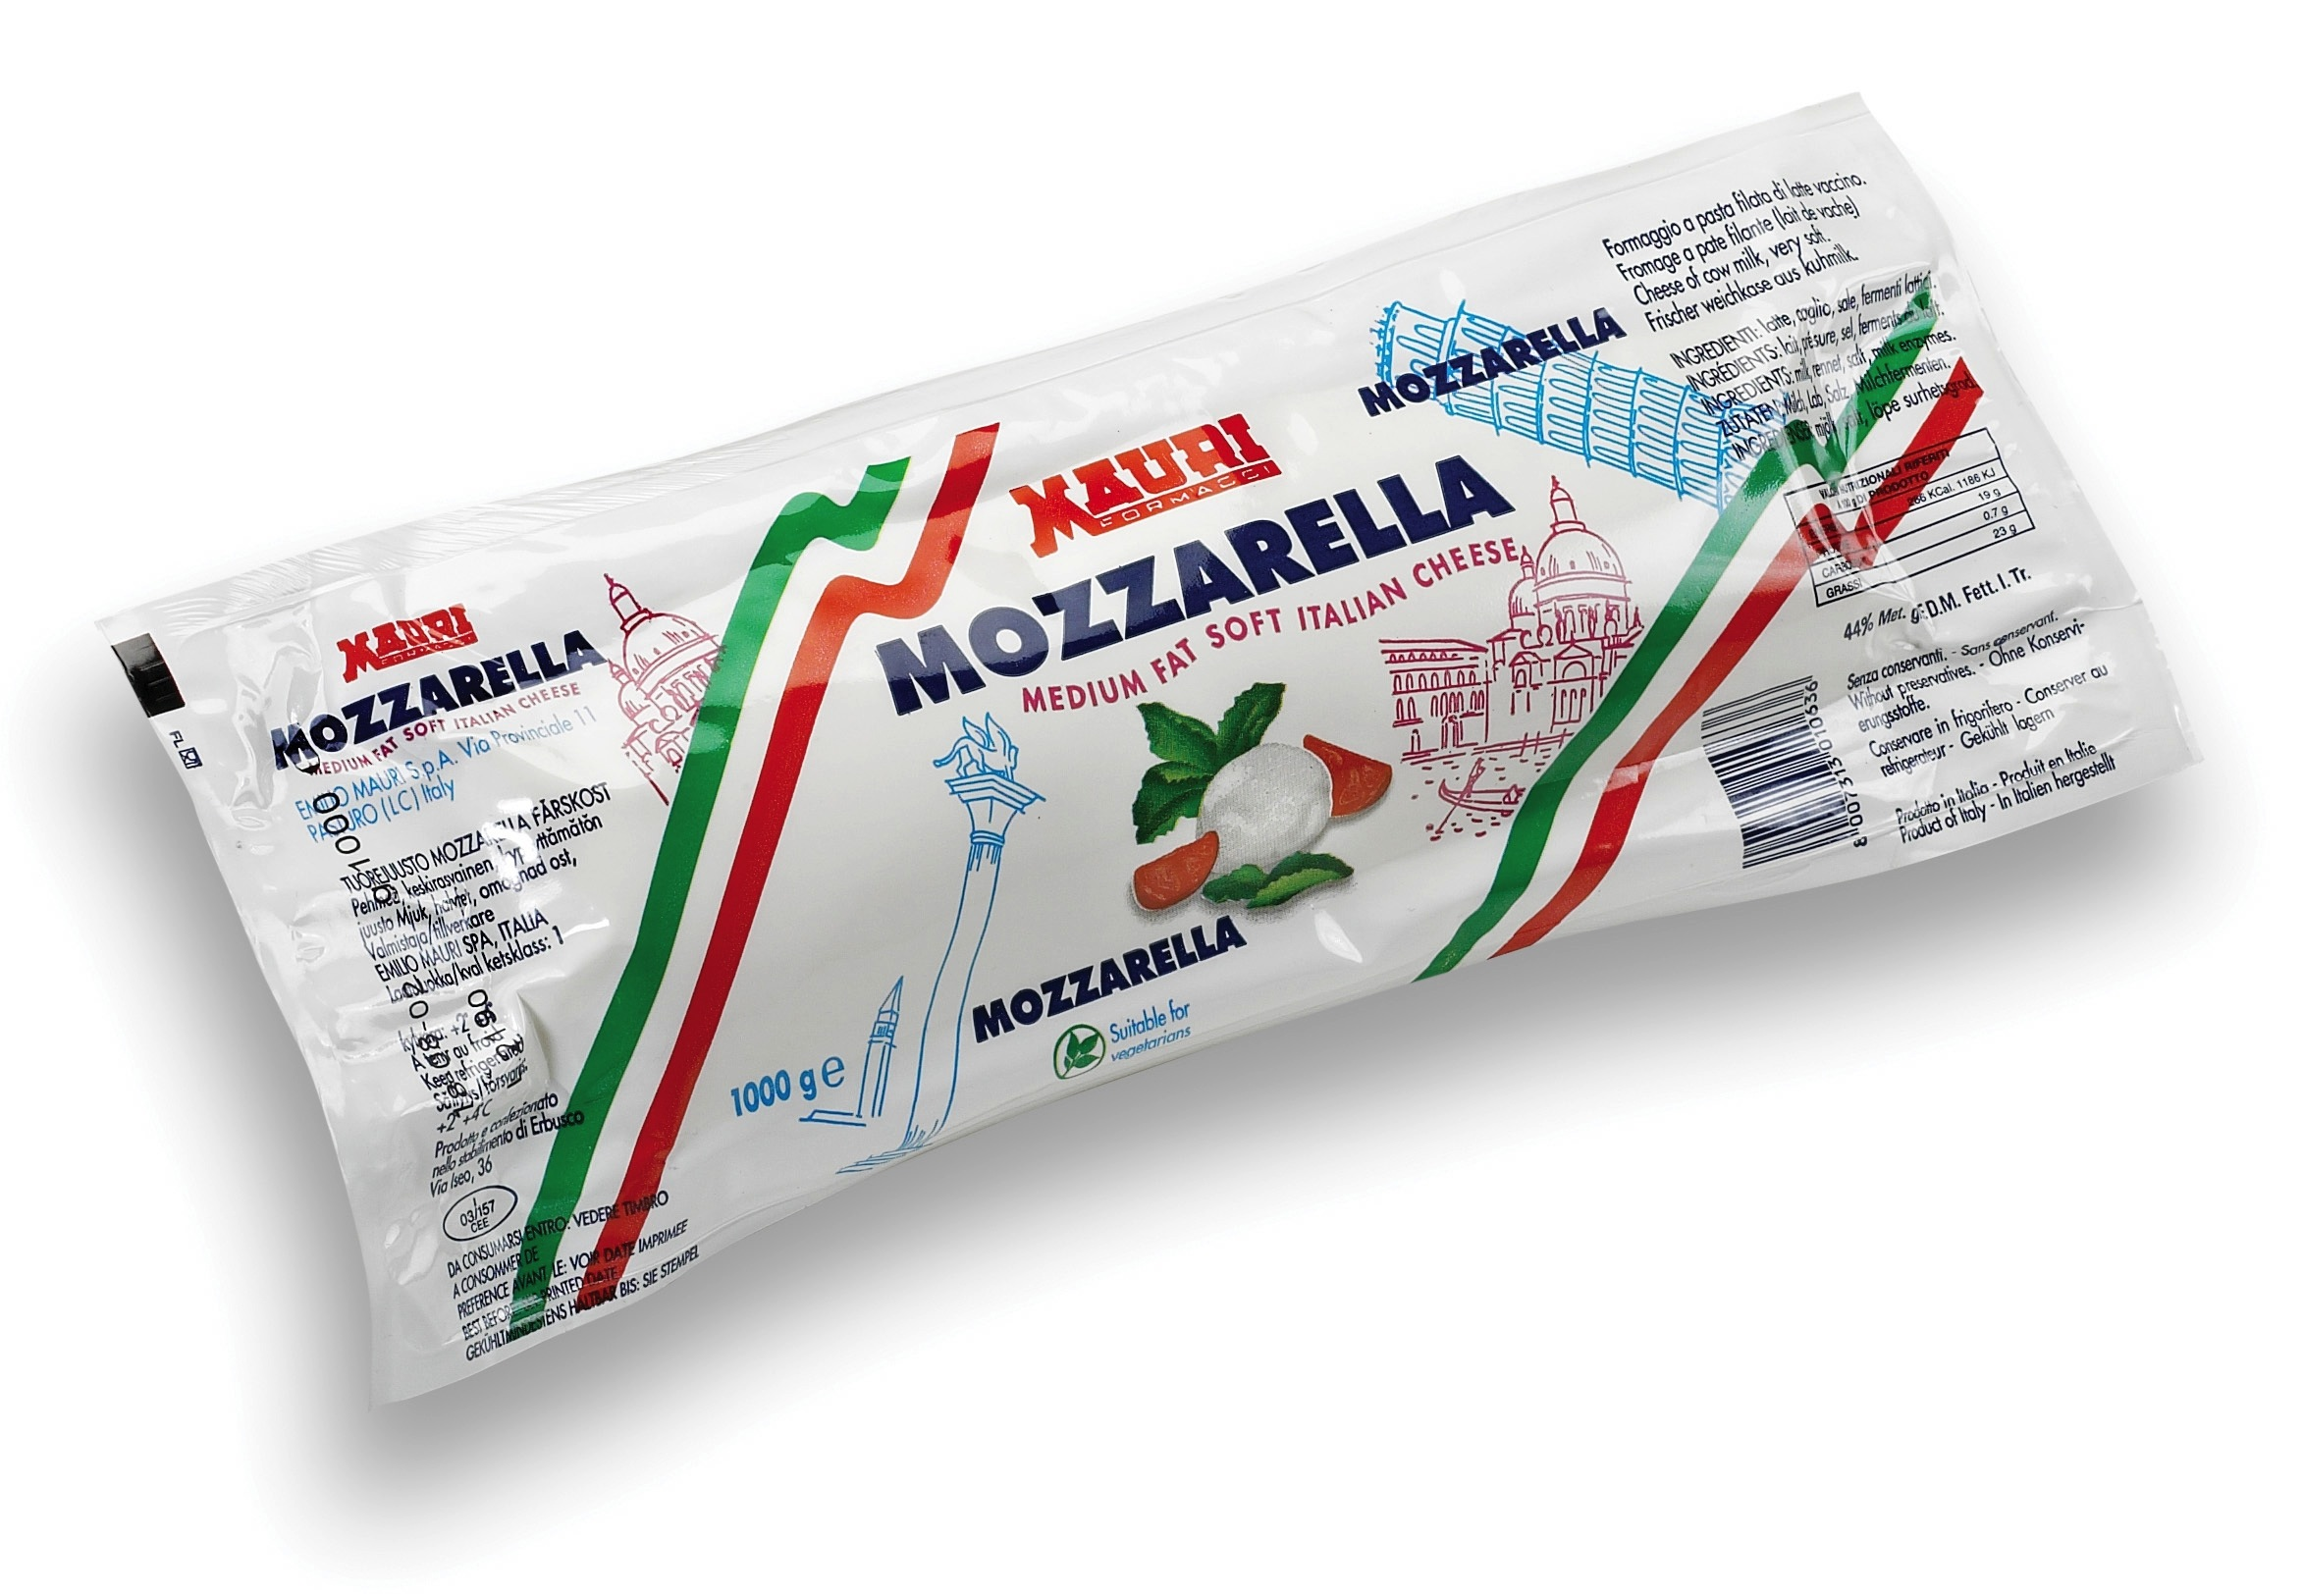 Mauri Mozzarella